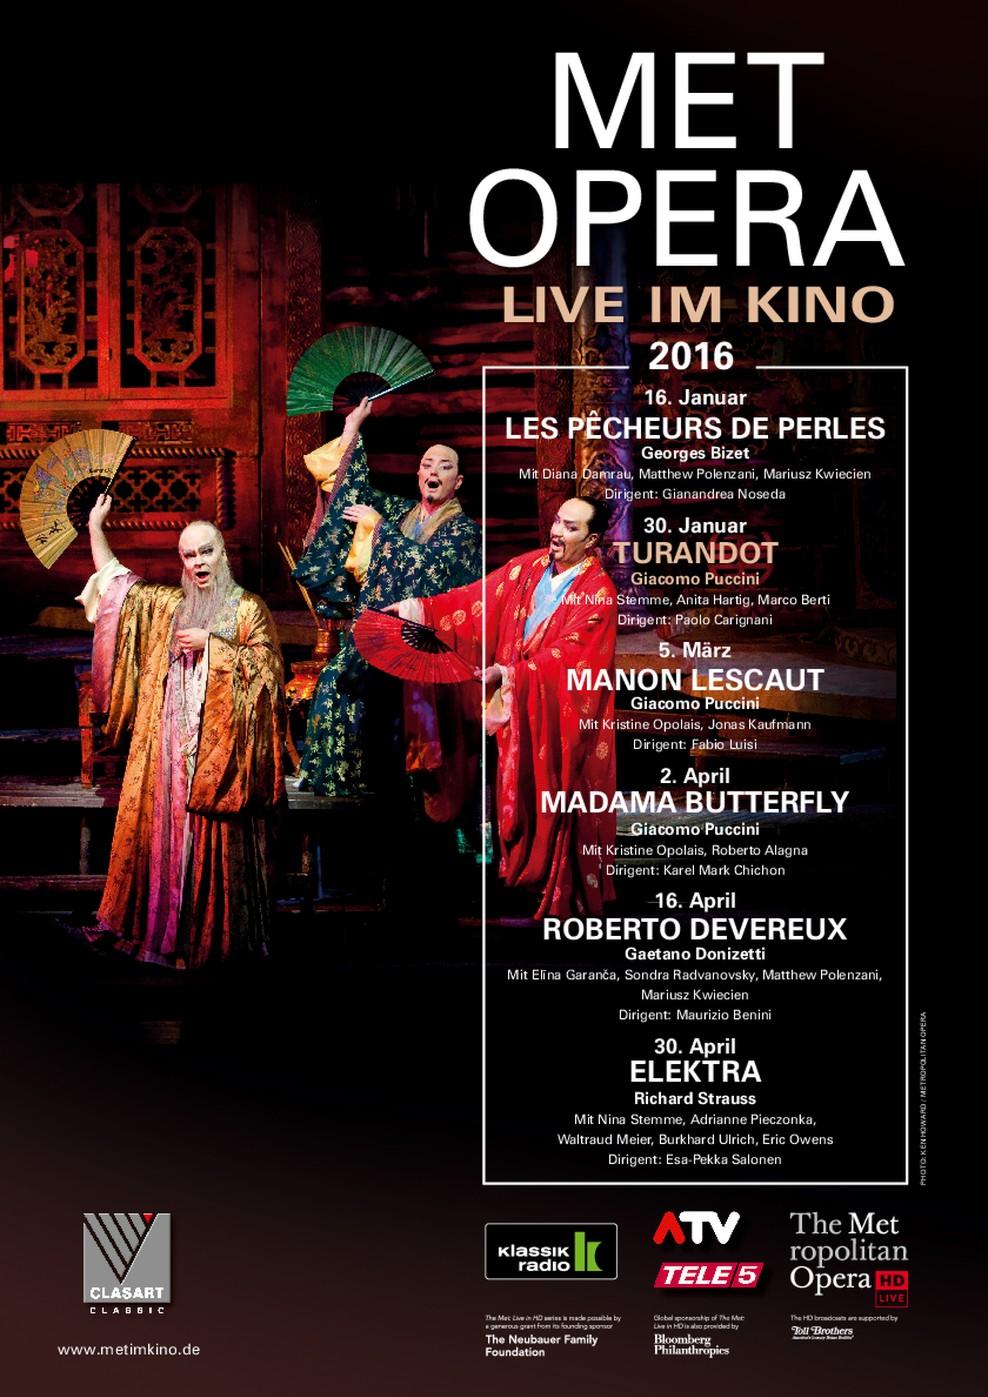 Met Opera 2015/16: Turandot (Puccini) (Poster)